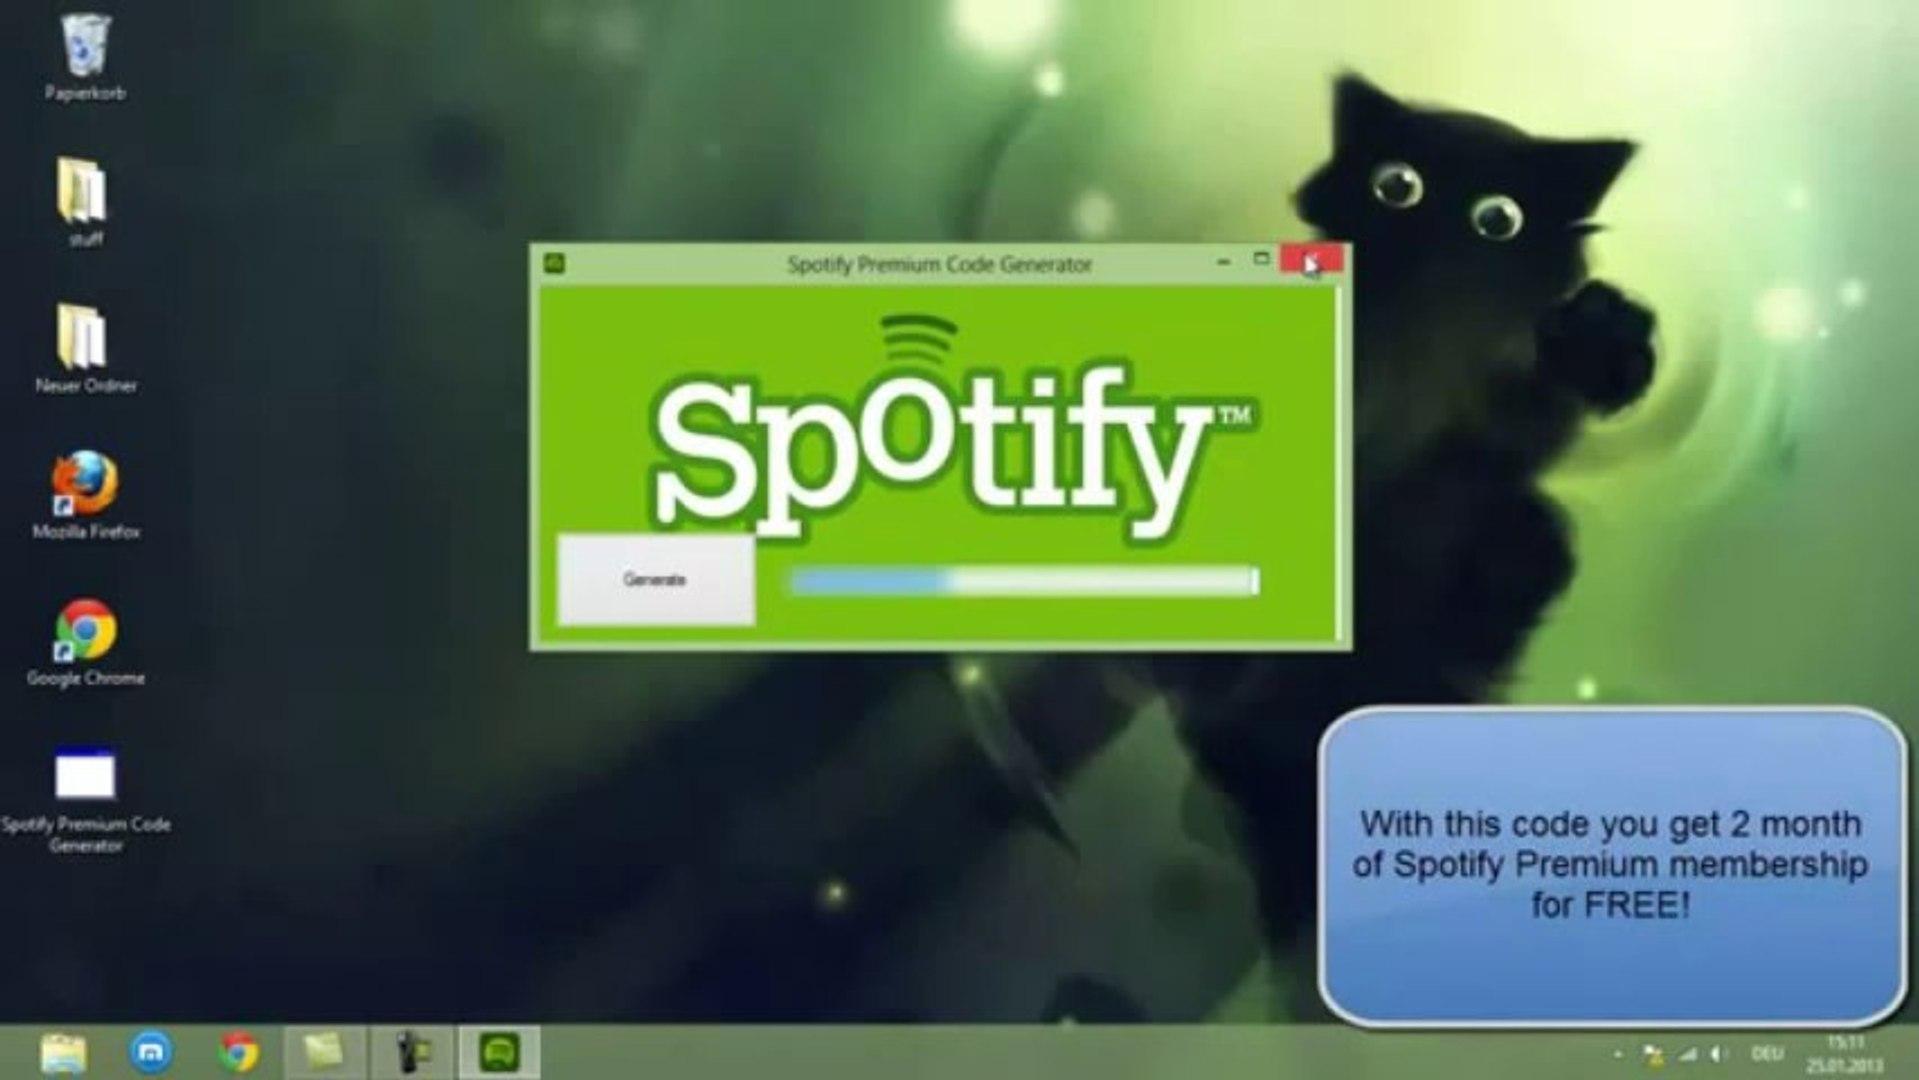 Spotify premium codes generator